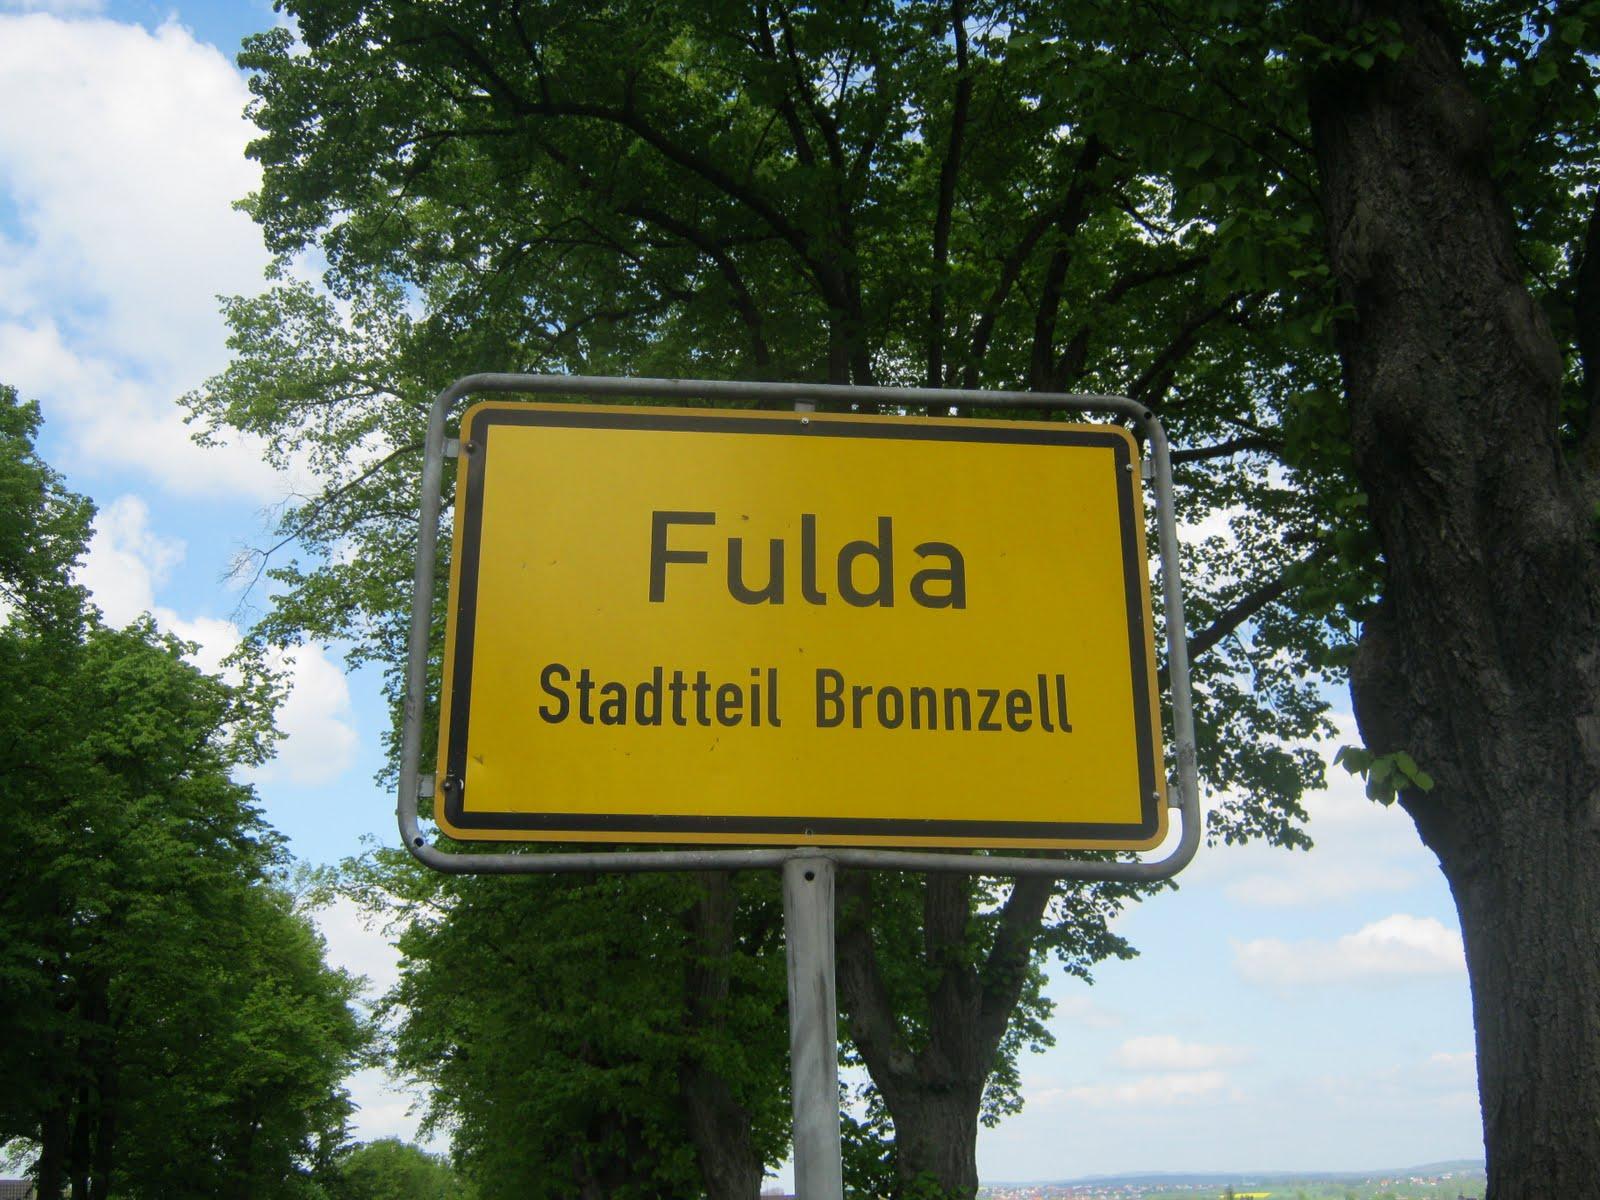 Rebekka auf reisen 5 etappe fulda w rzburg for Wurzburg pension mit fruhstuck